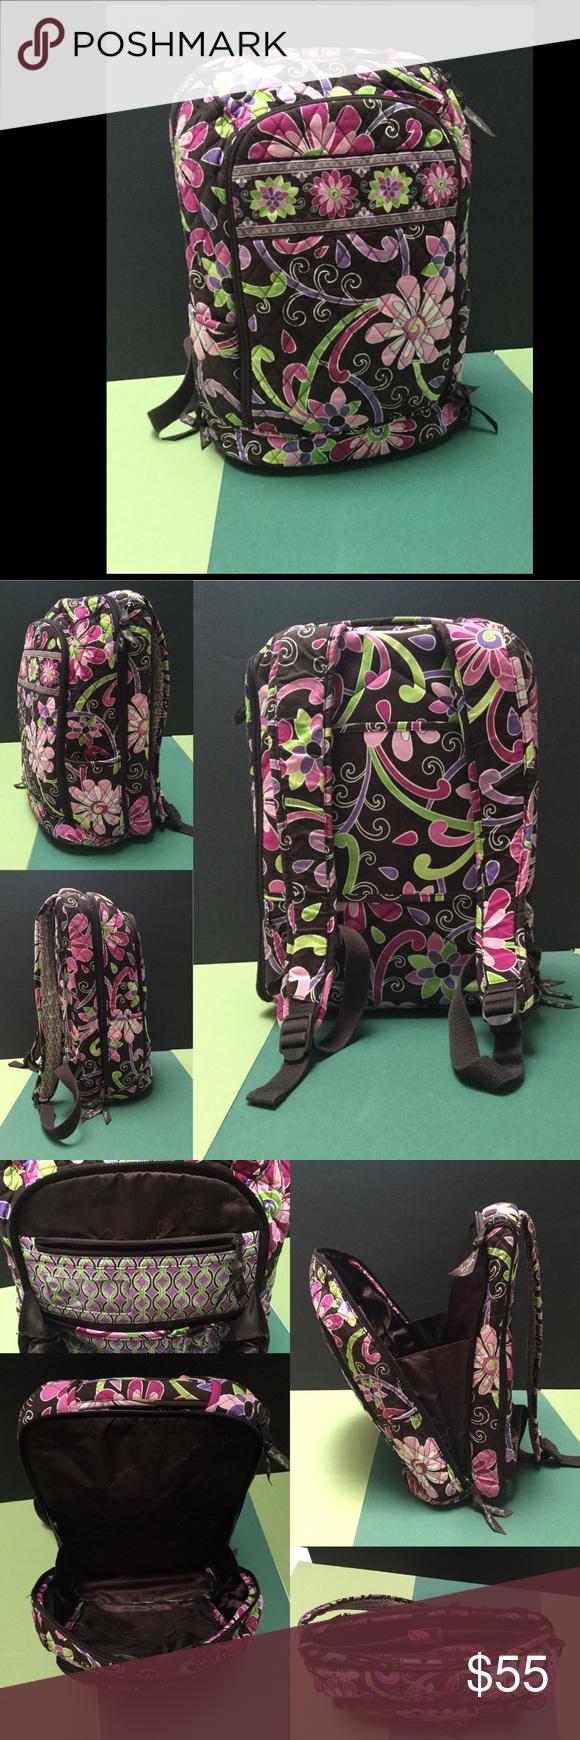 Vera Bradley Purple Punch Backpack Vera Bradley Backpack in Purple Punch.  Very good condition! d29886c724